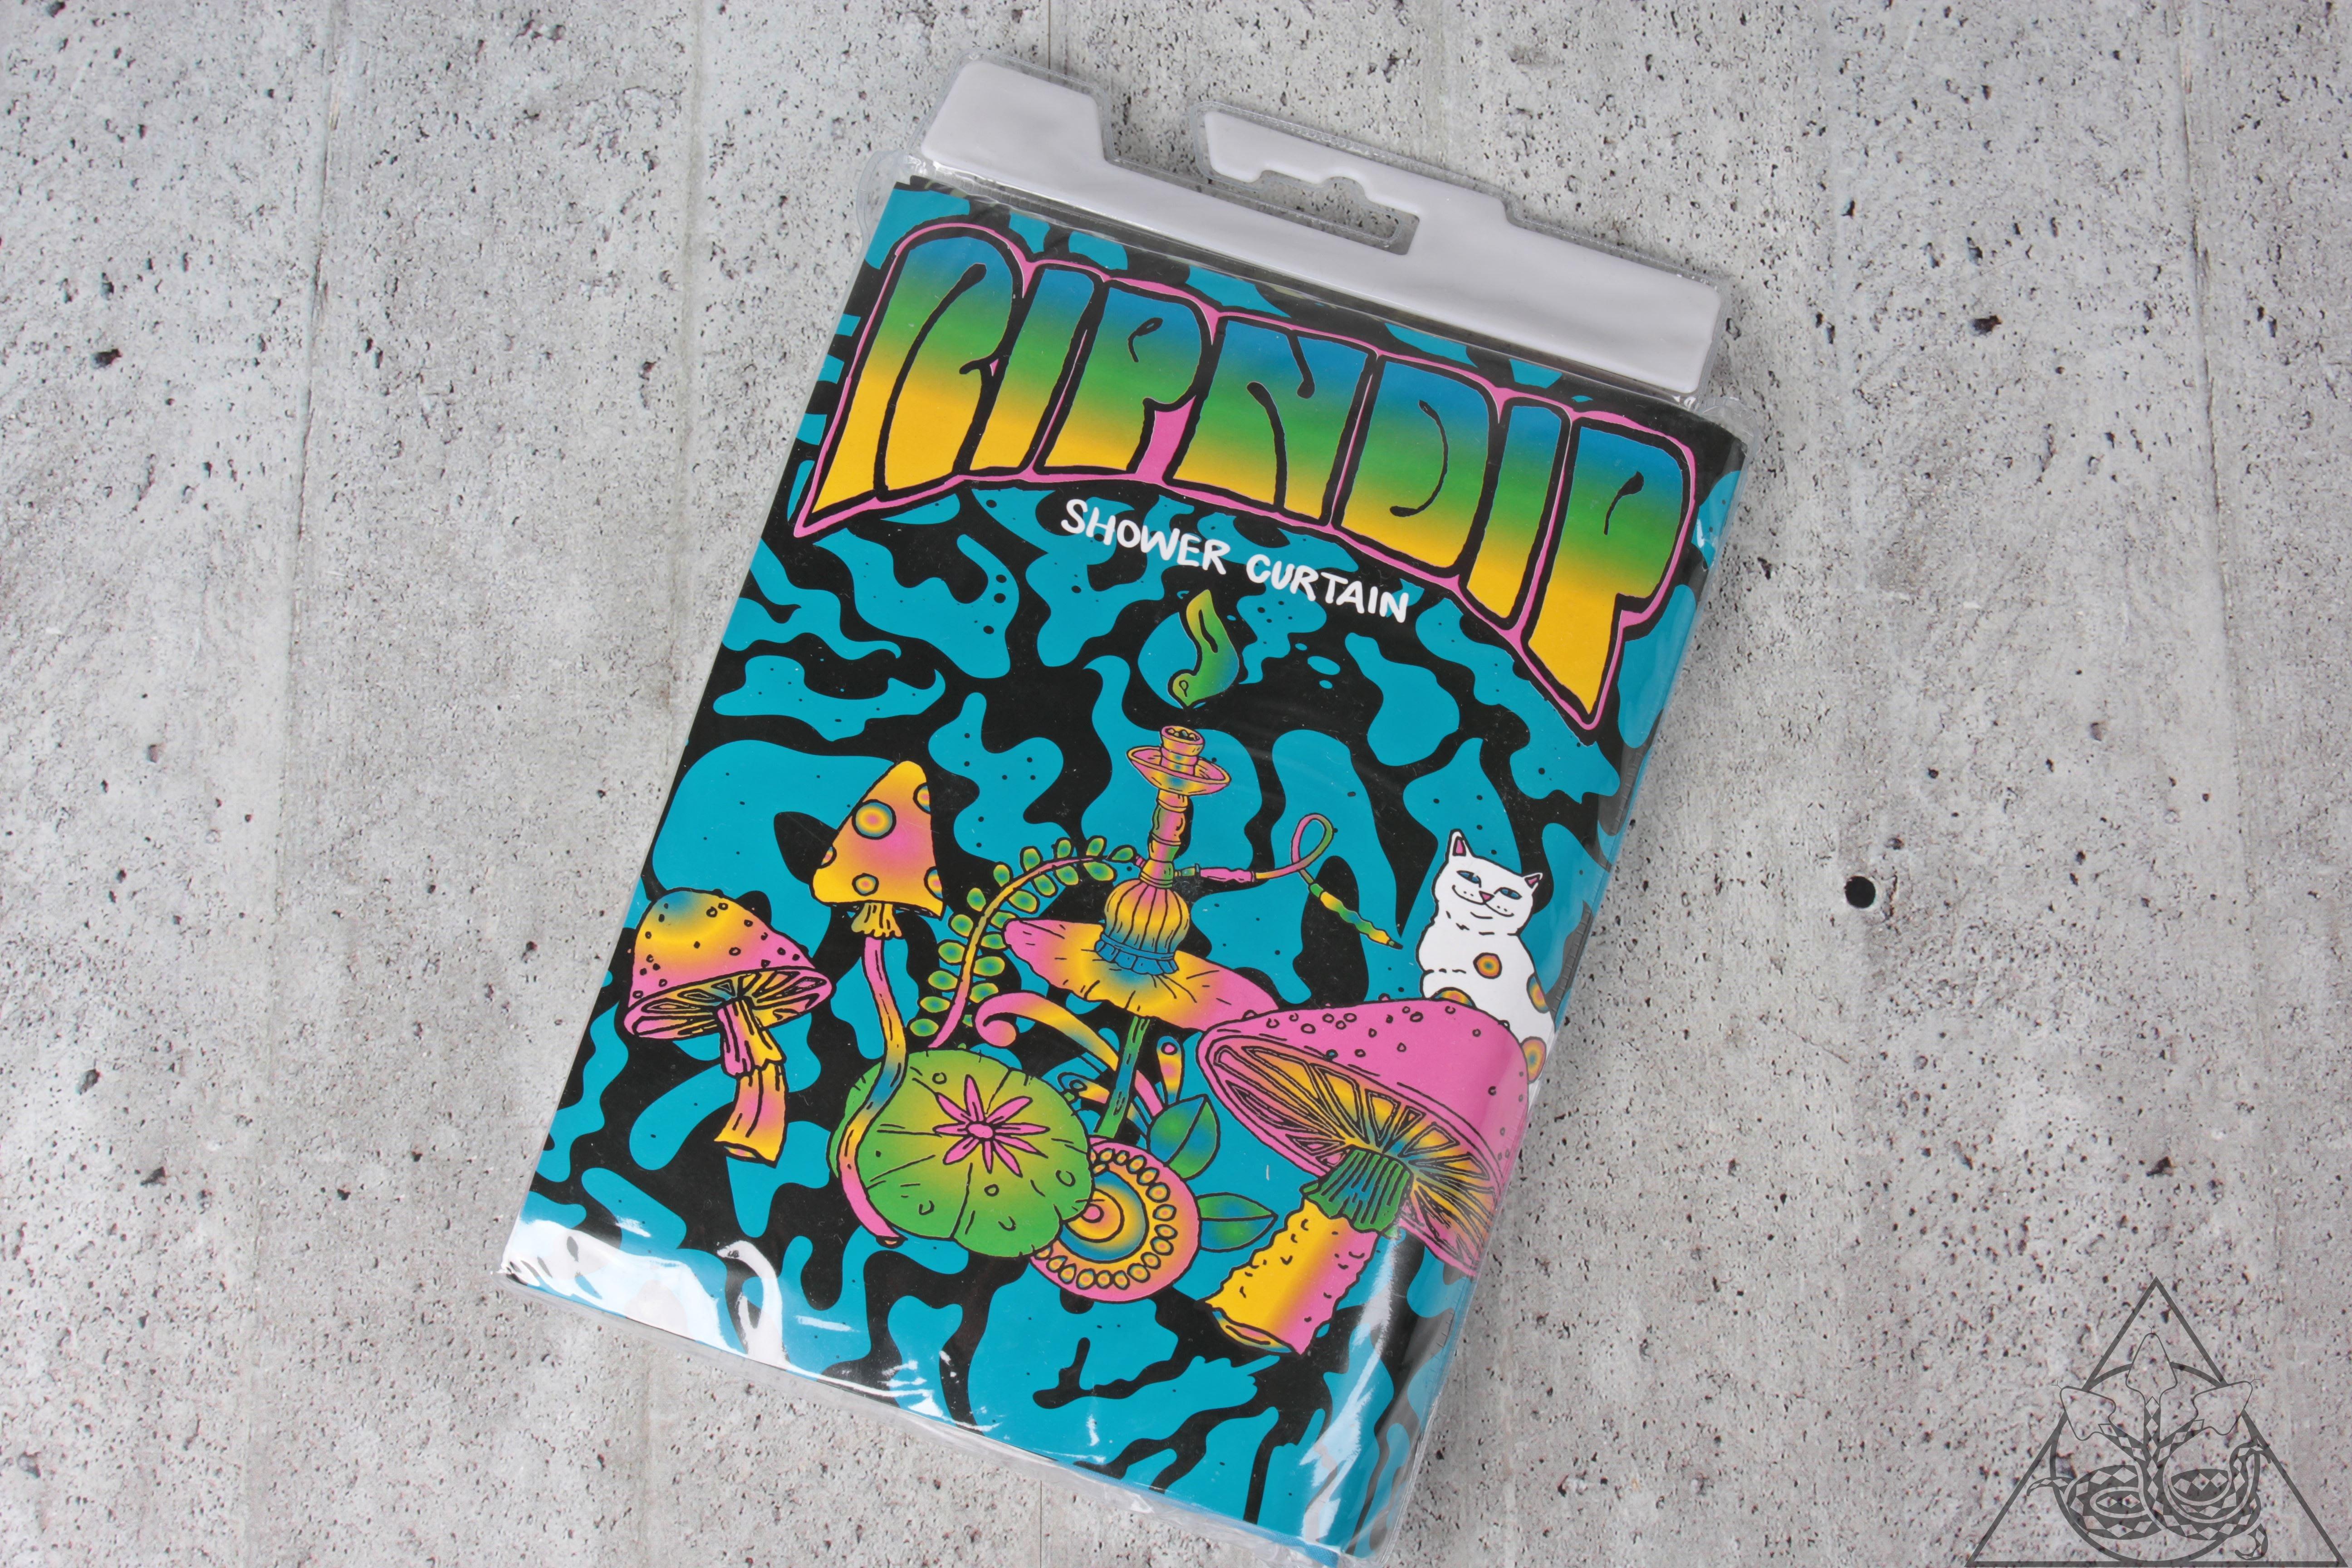 【HYDRA】Ripndip Psychedelic Shower Curtain 浴簾【RNP076】